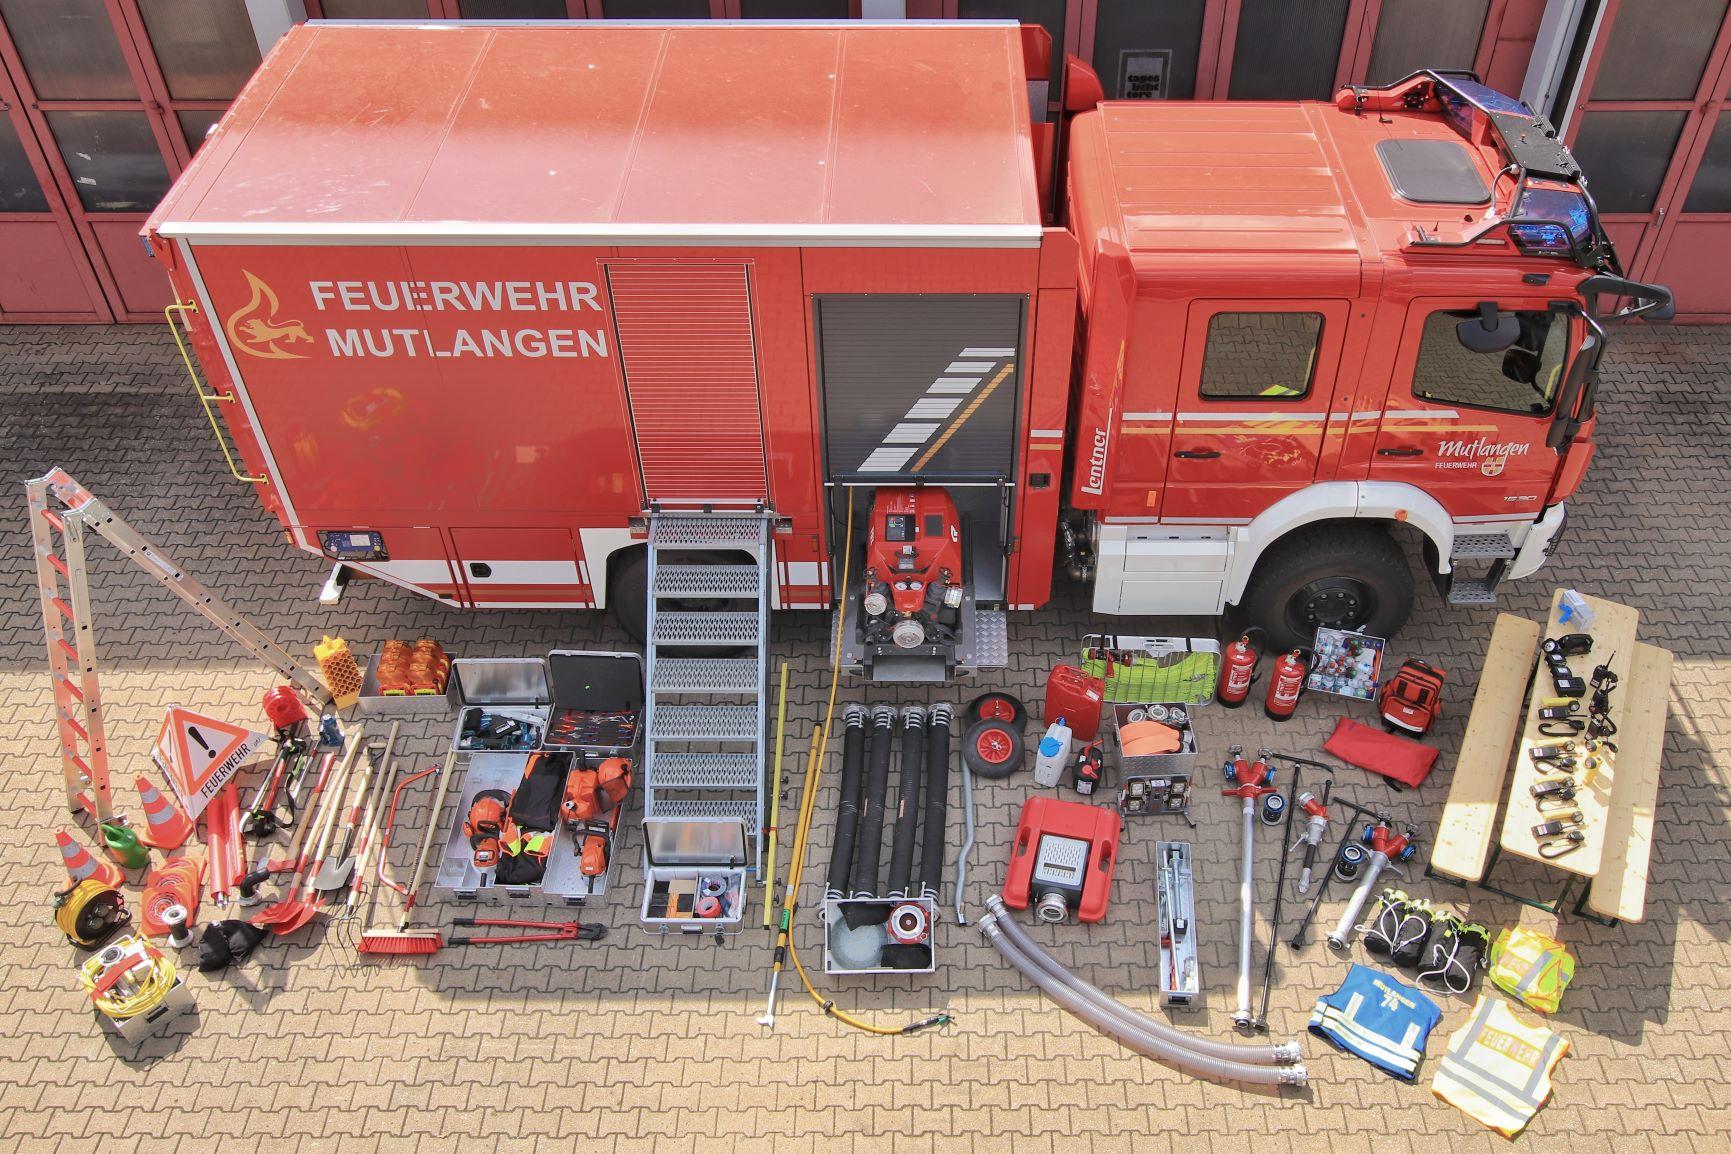 GW-L2, FF Mutlangen, Lentner auf Mercedes